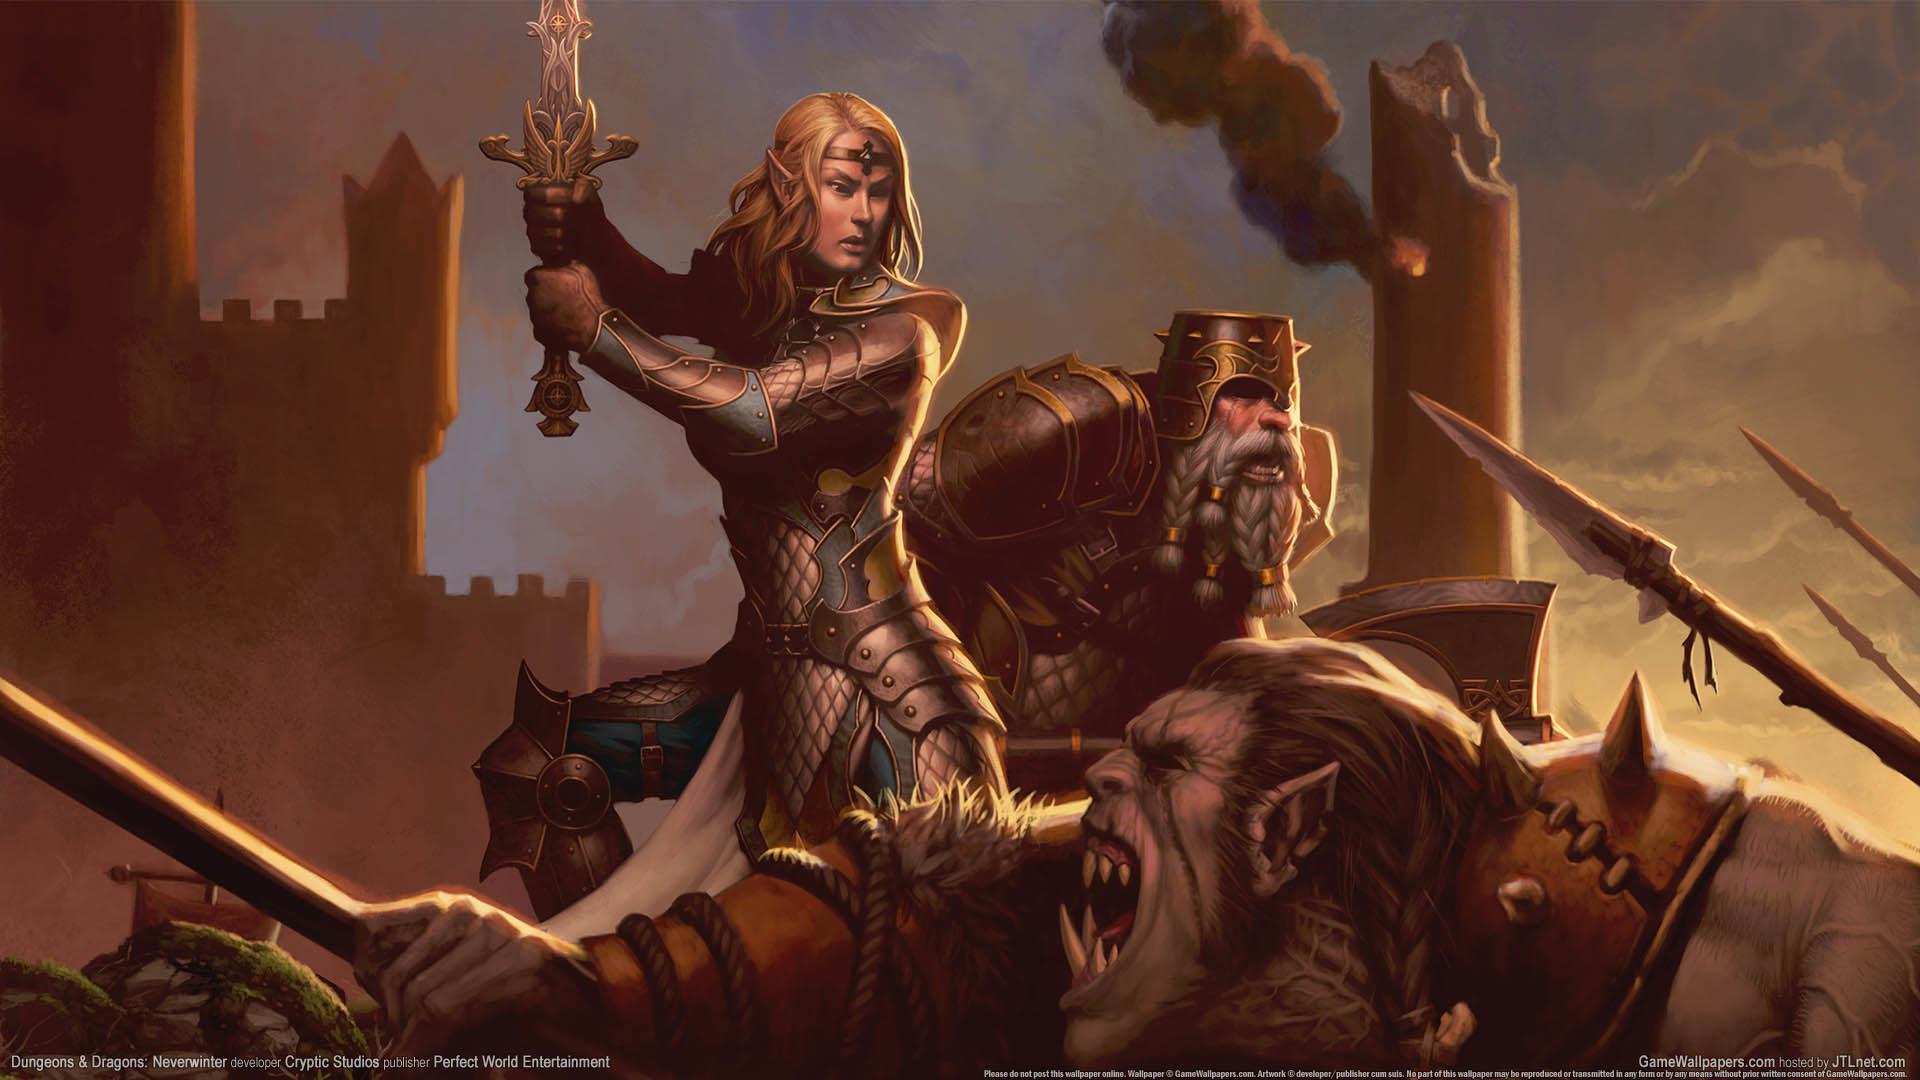 Dungeons & Dragons: Neverwinter wallpaper 01 1920×1080